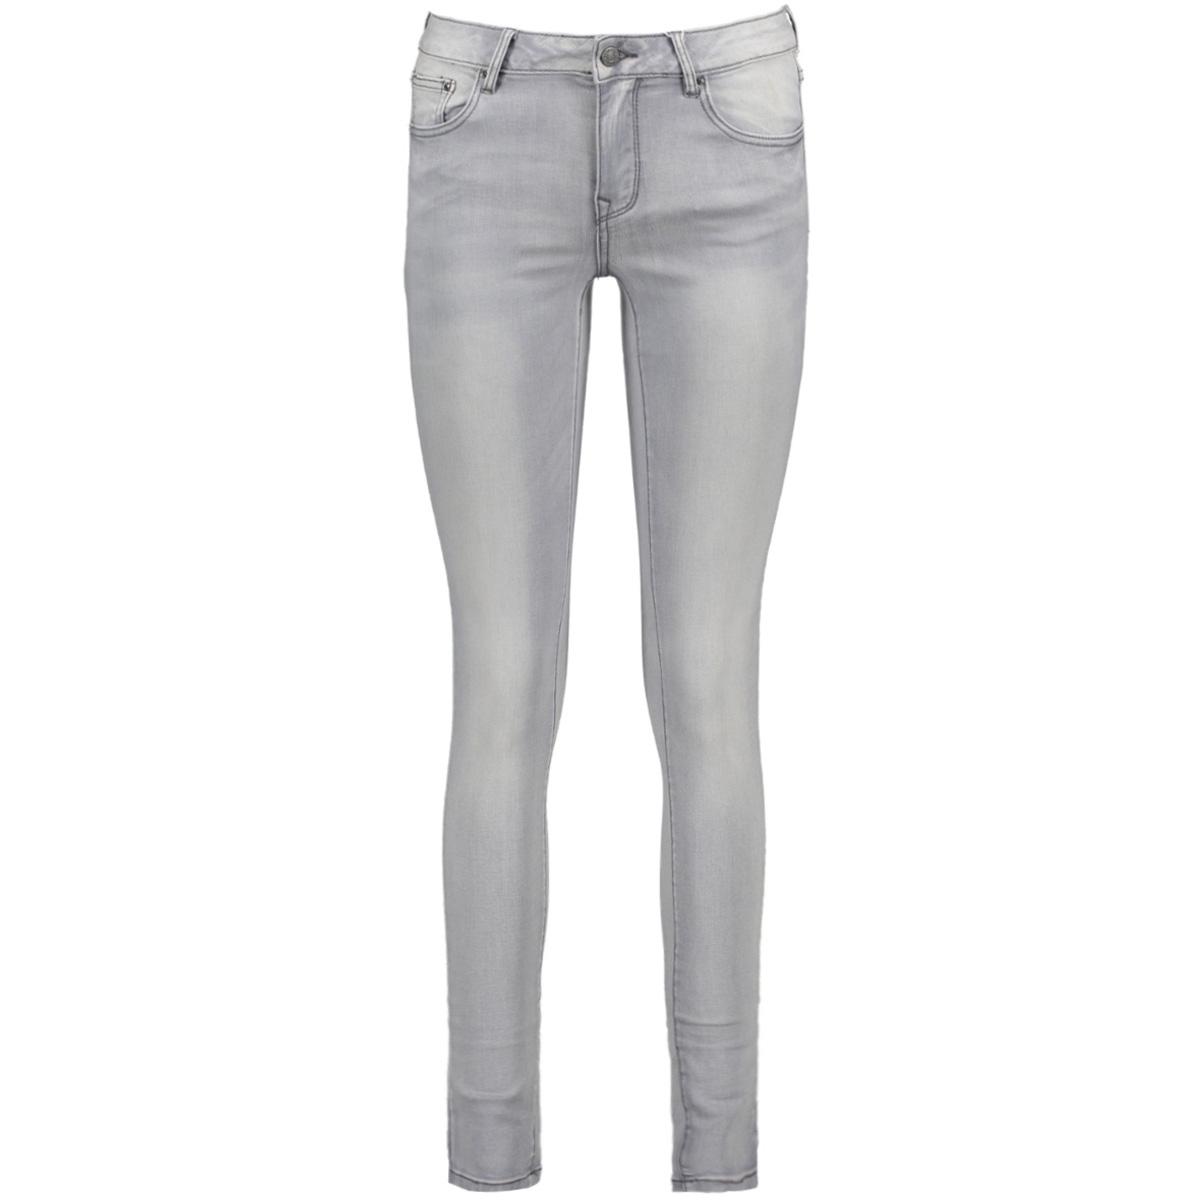 vicommit rw 5p hk0101 grey gv/2 14044592 vila jeans grey denim